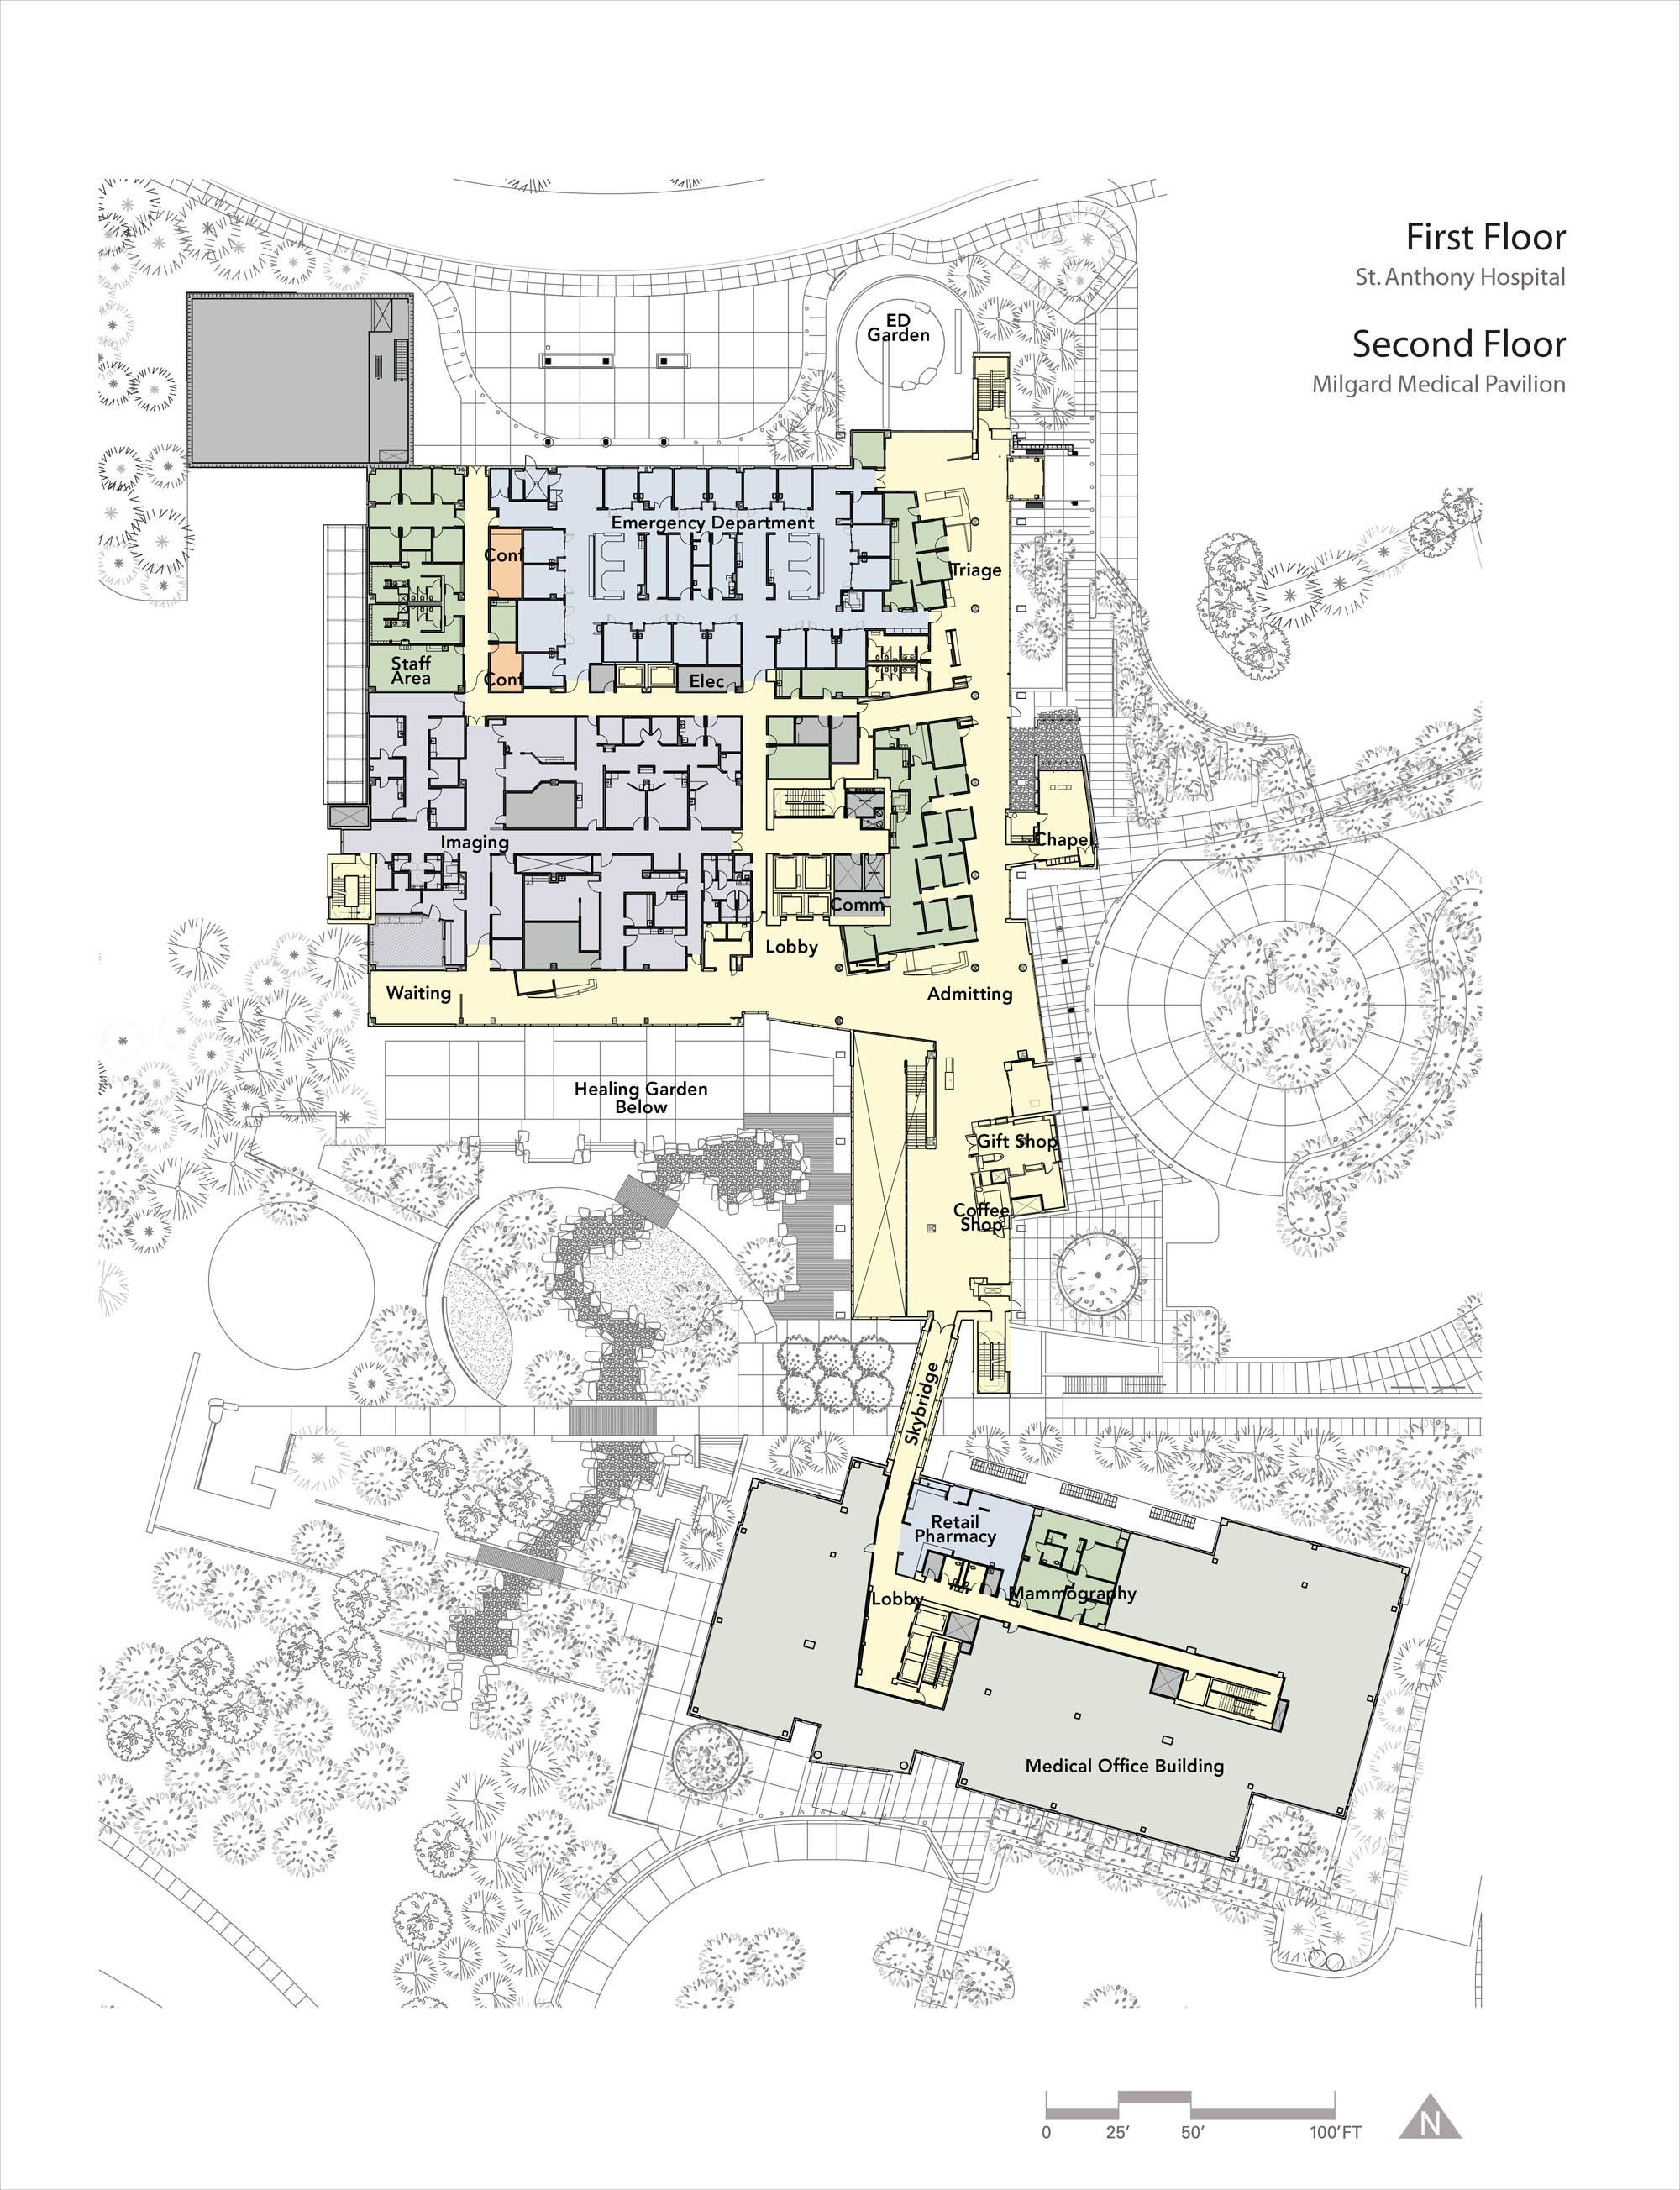 Endoscopy Lab Design: Gallery Of St. Anthony Hospital / ZGF Architects